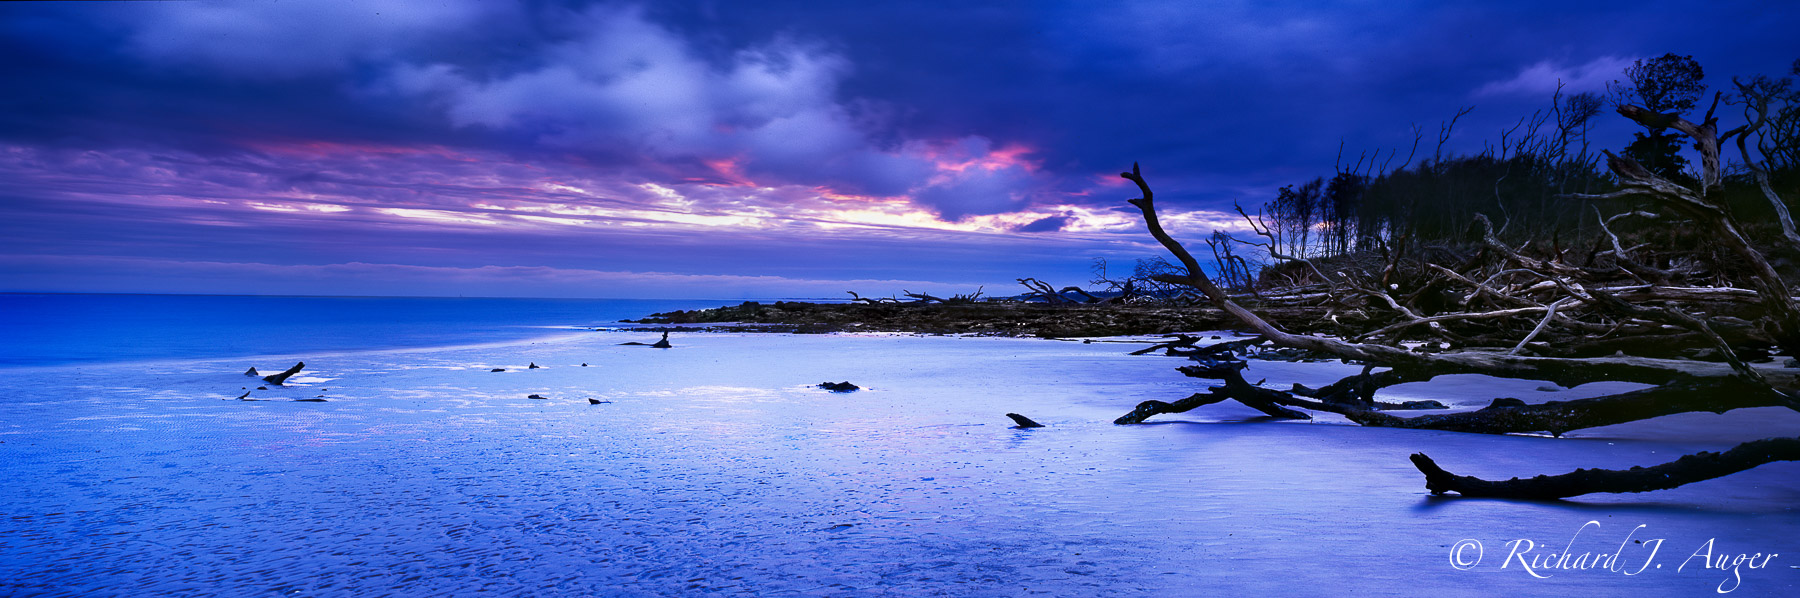 Big Talbot Island State Park, Florida, Driftwood, Landscape, Photograph, Panorama, Beach